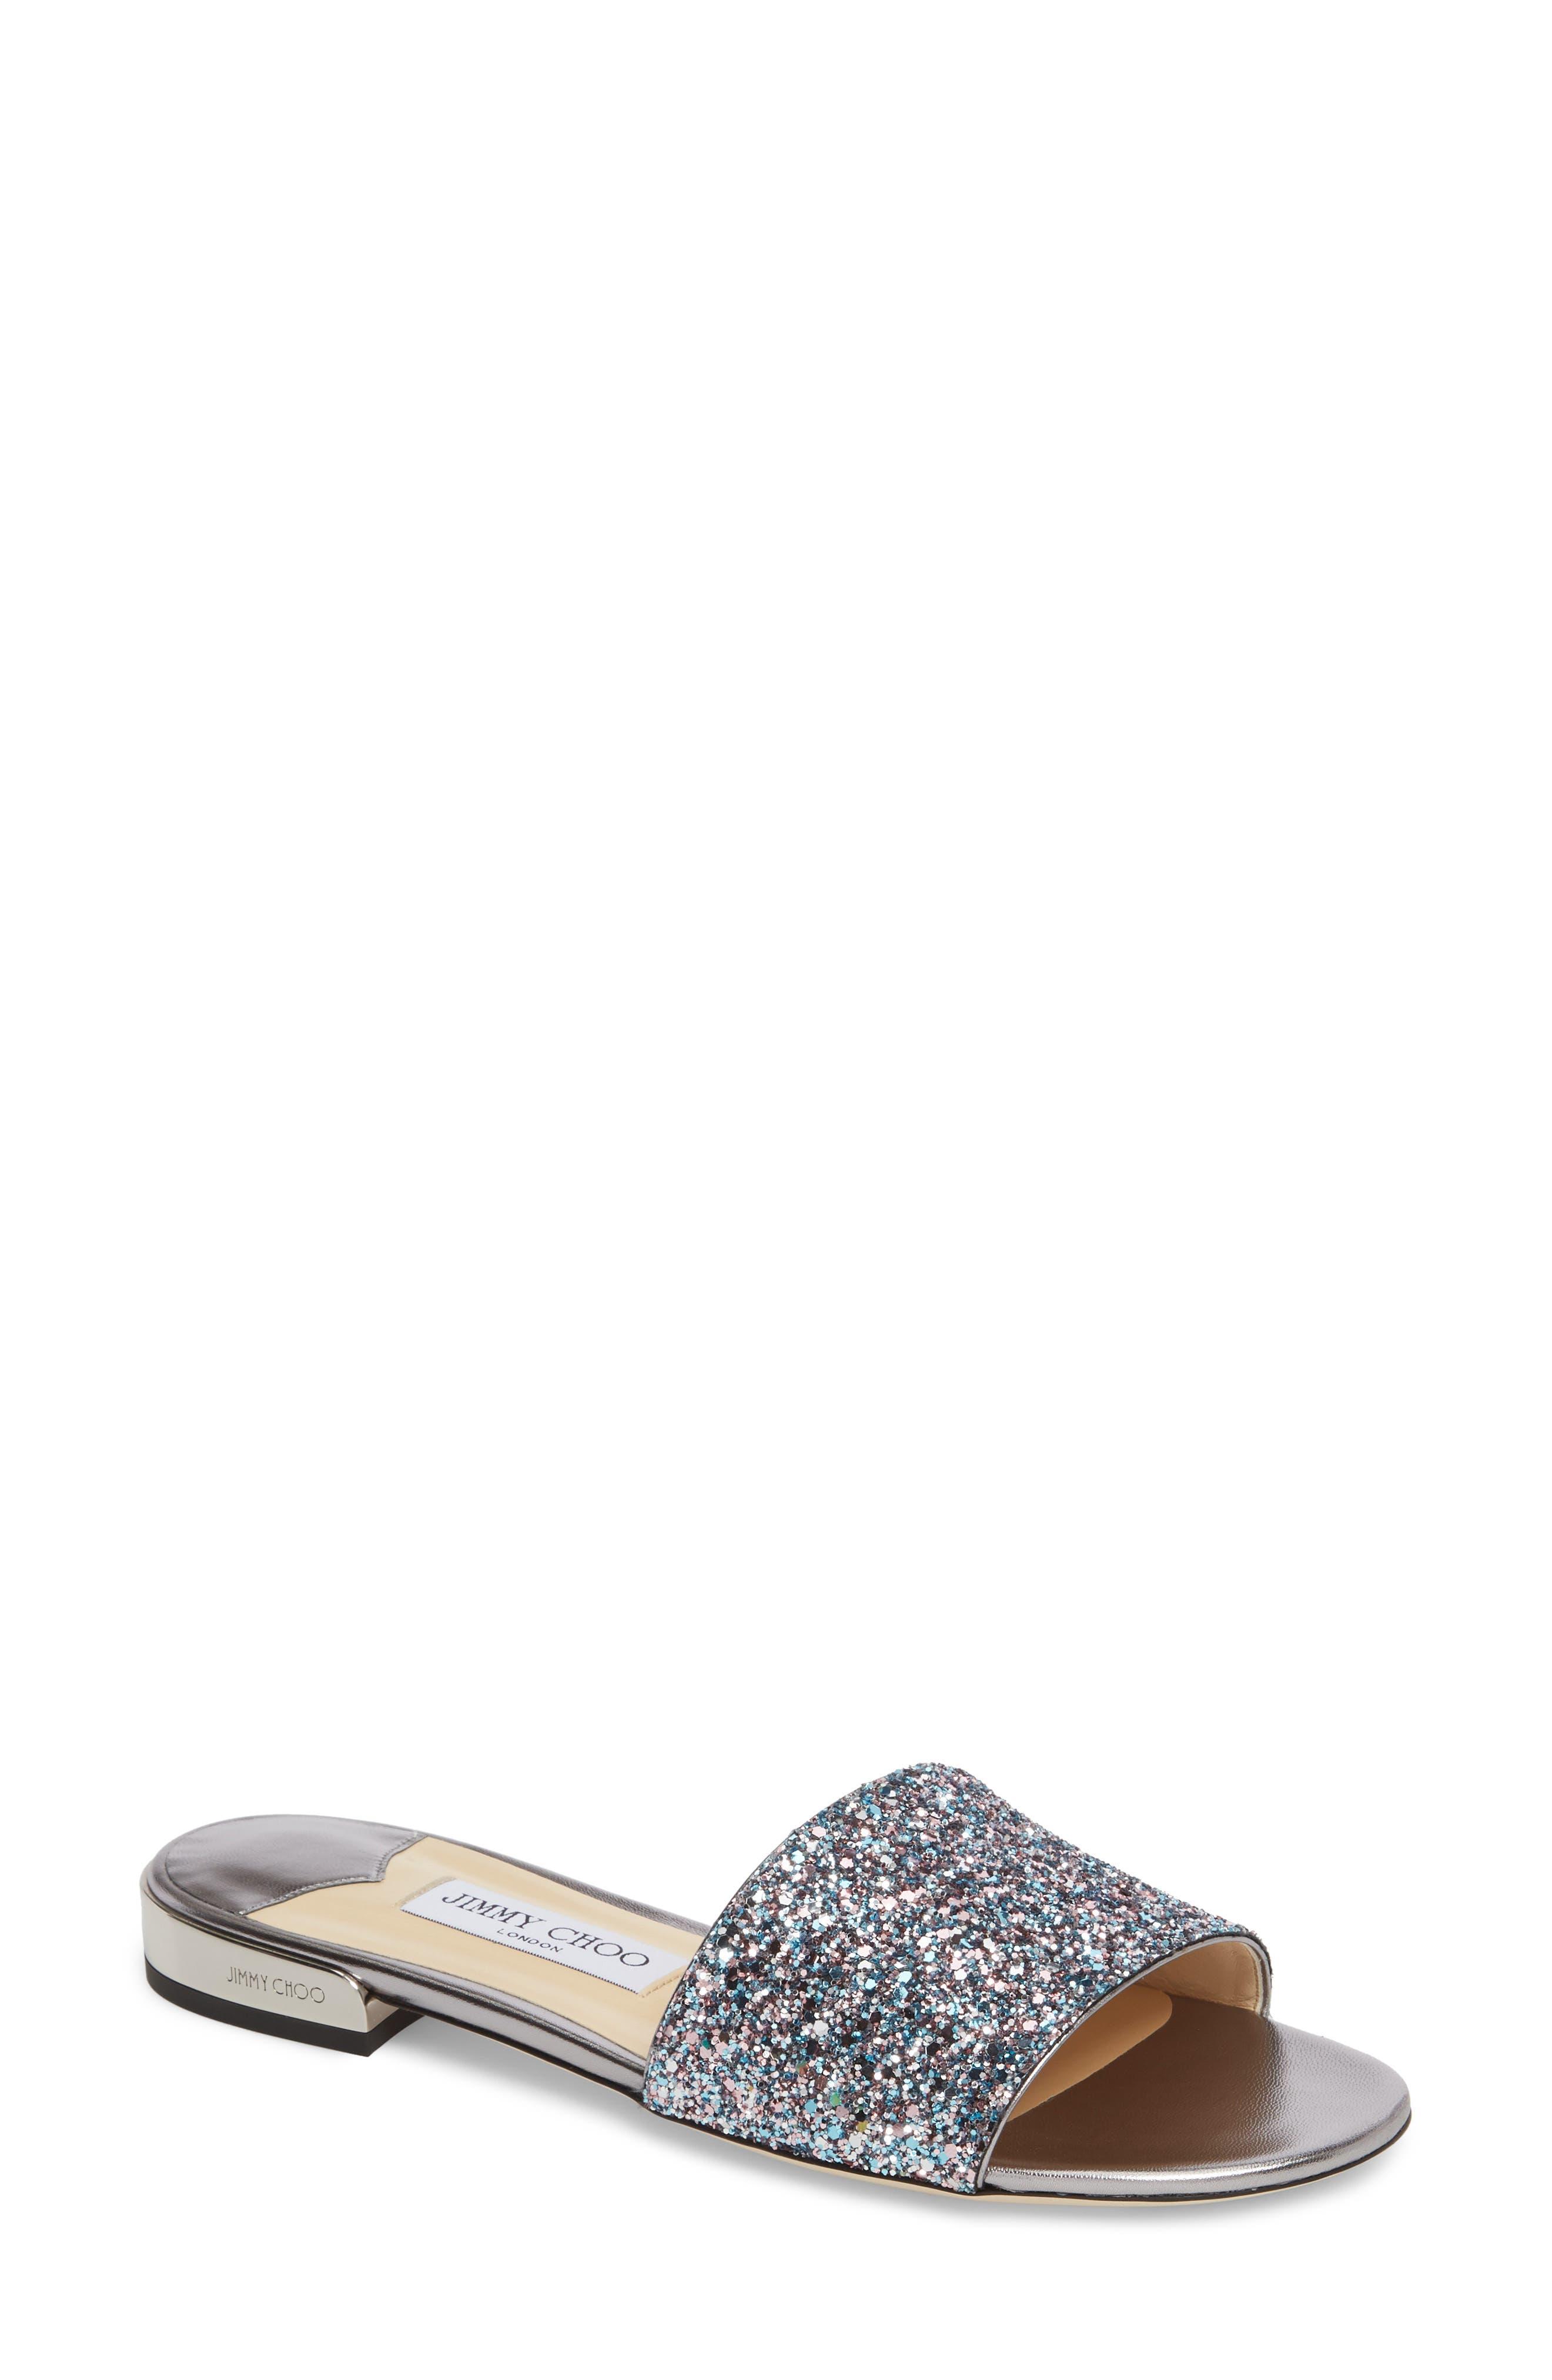 Jimmy Choo Joni Embellished Slide Sandal (Women)